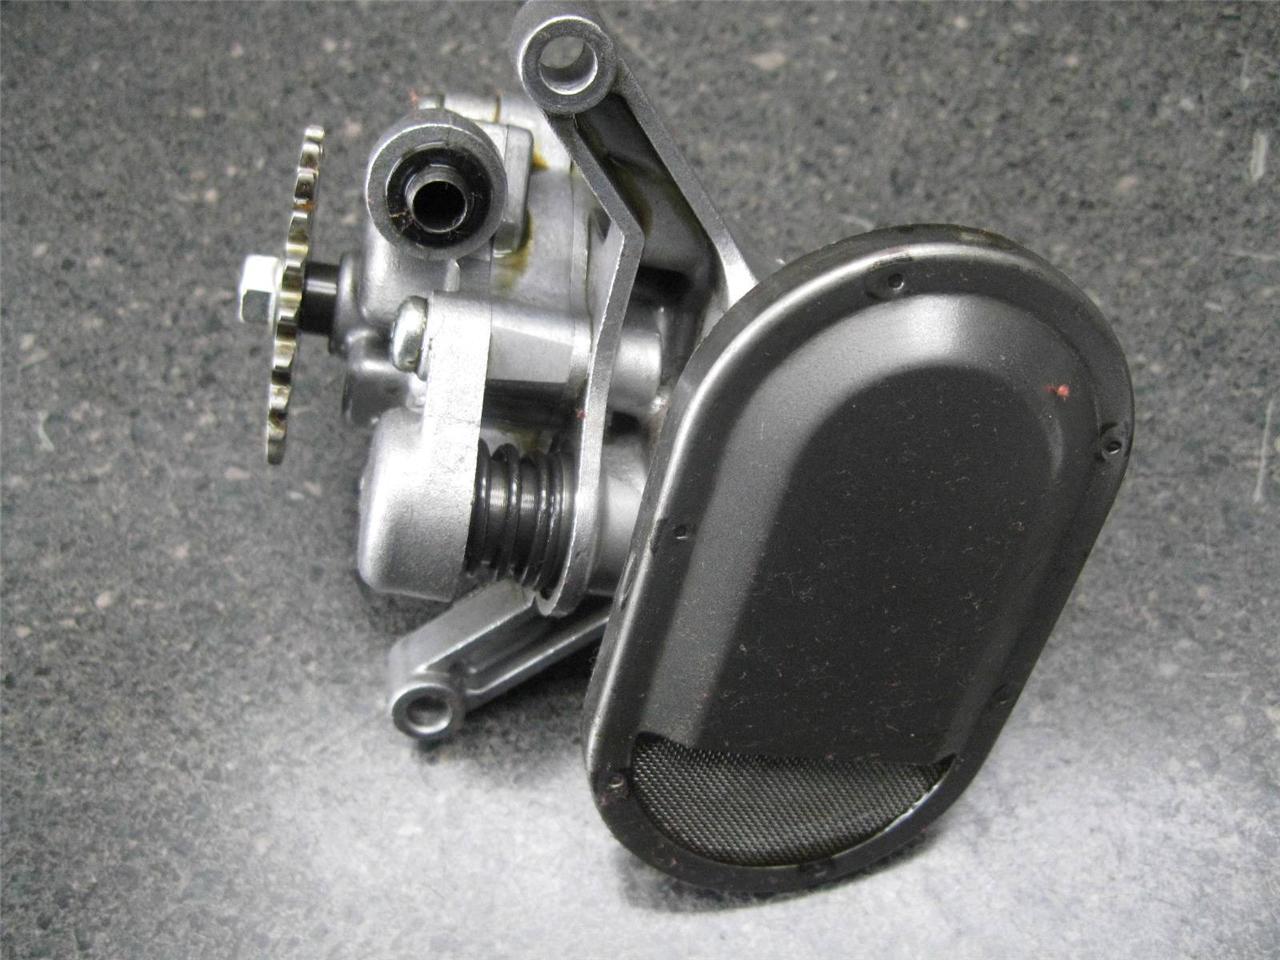 82 Emailoils Contact Usco Ltd Mail: 82 Yamaha Seca Turbo 650 XJ650 Oil Pump 31B